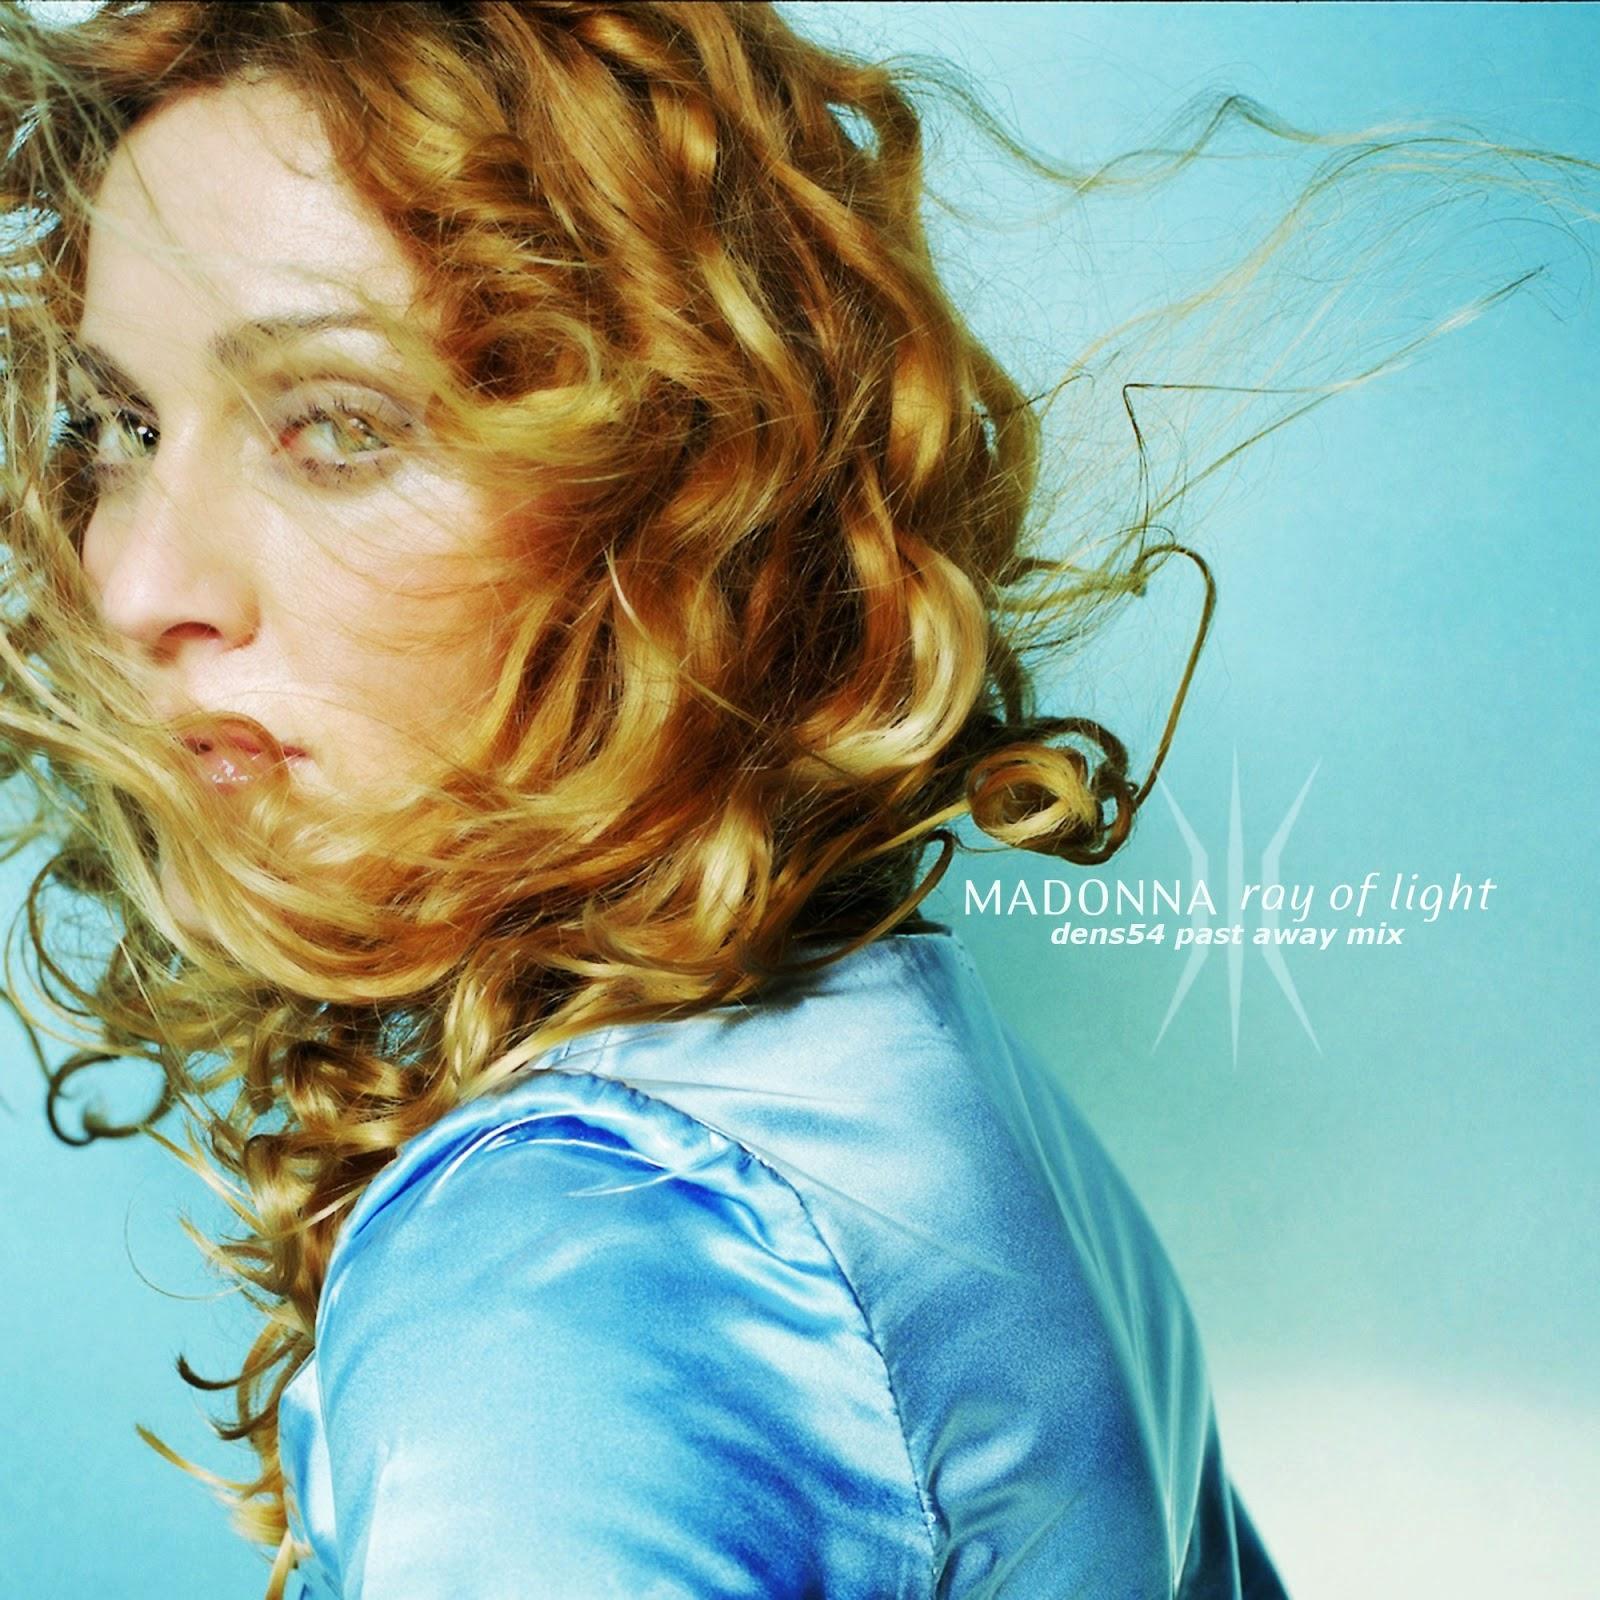 madonna ray of light album cover - photo #3